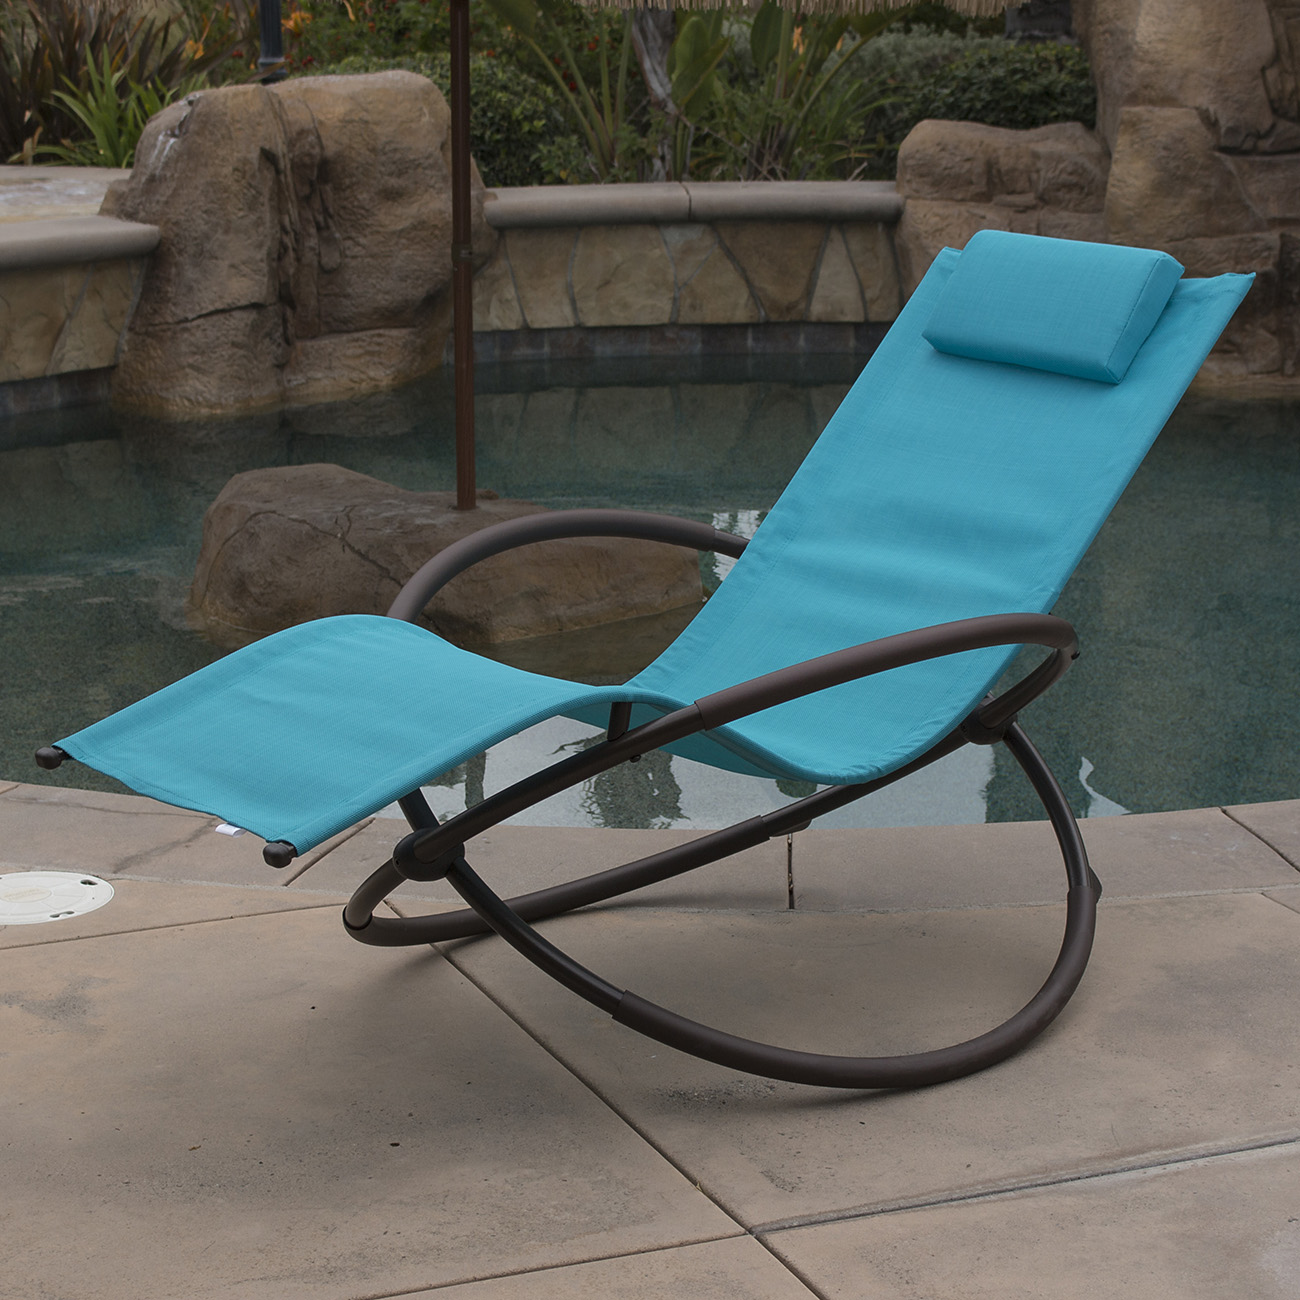 Orbit Zero Gravity Chair Lounge Beach Pool Outdoor